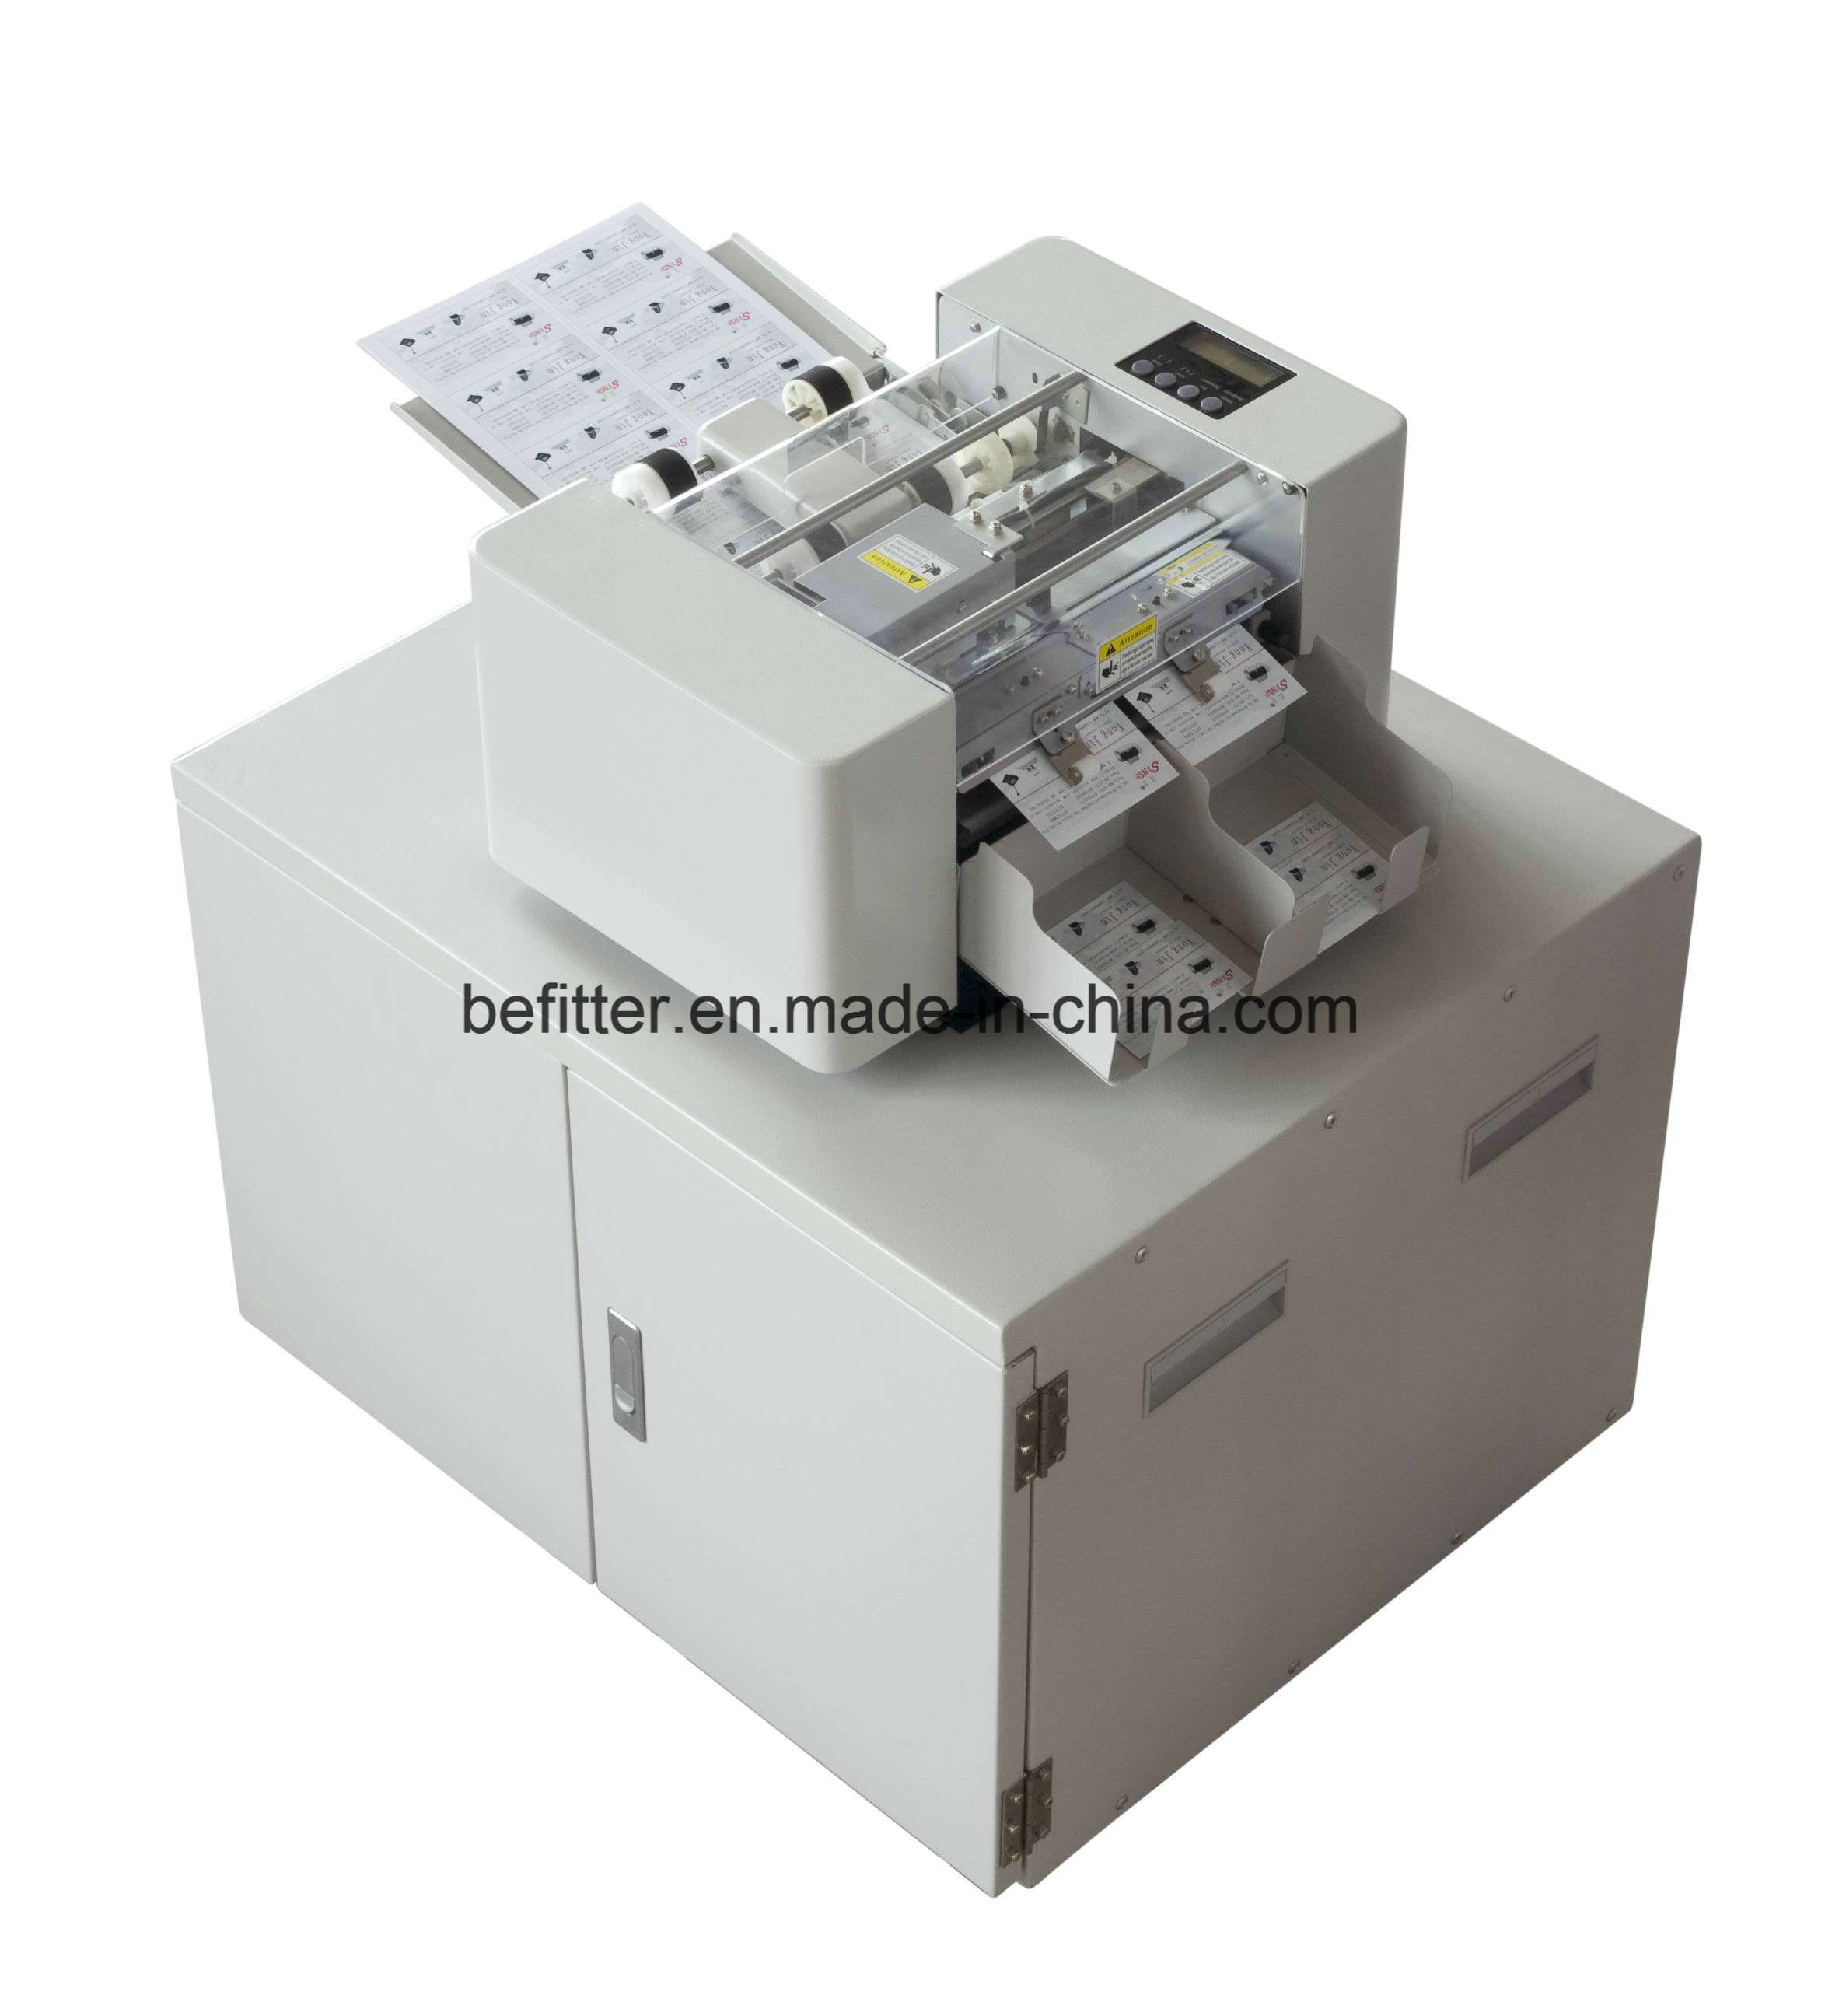 China SSA-001-I A4 automatic business card cutter - China business ...